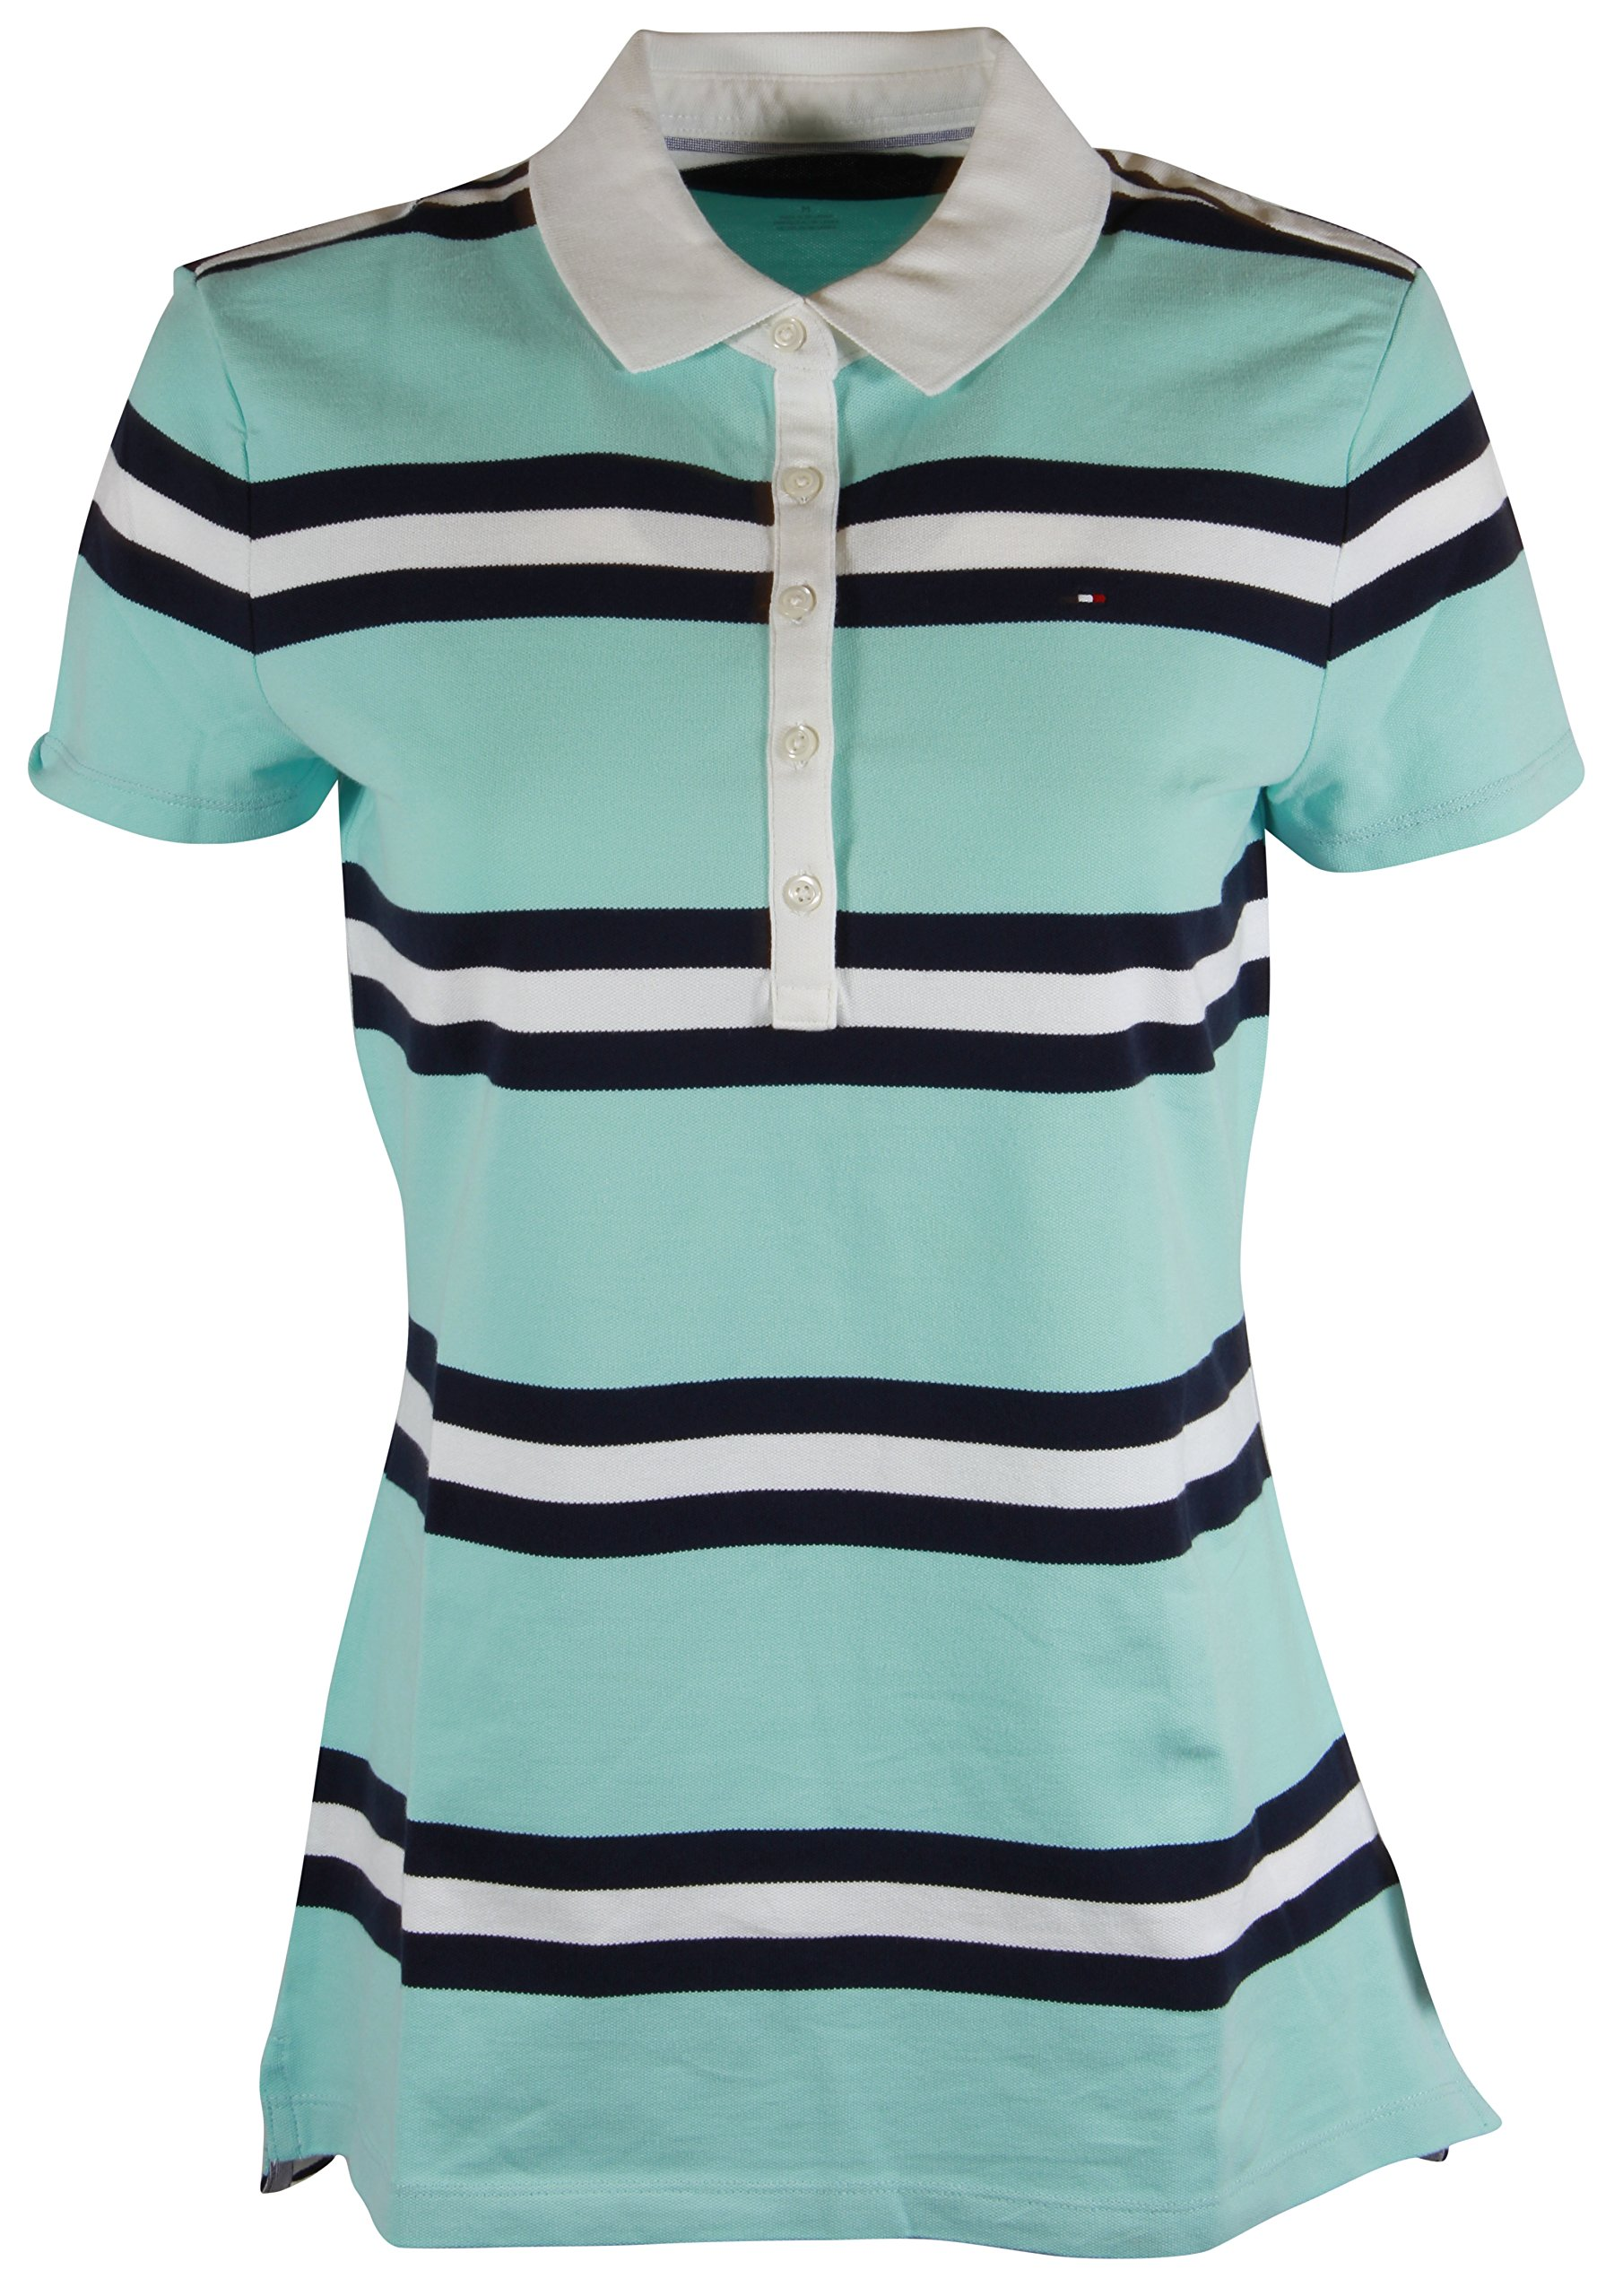 9b3f00b7 Galleon - Tommy Hilfiger Womens Classic Fit Logo Polo T-Shirt (Medium,  Aqua/Navy/White Stripes)